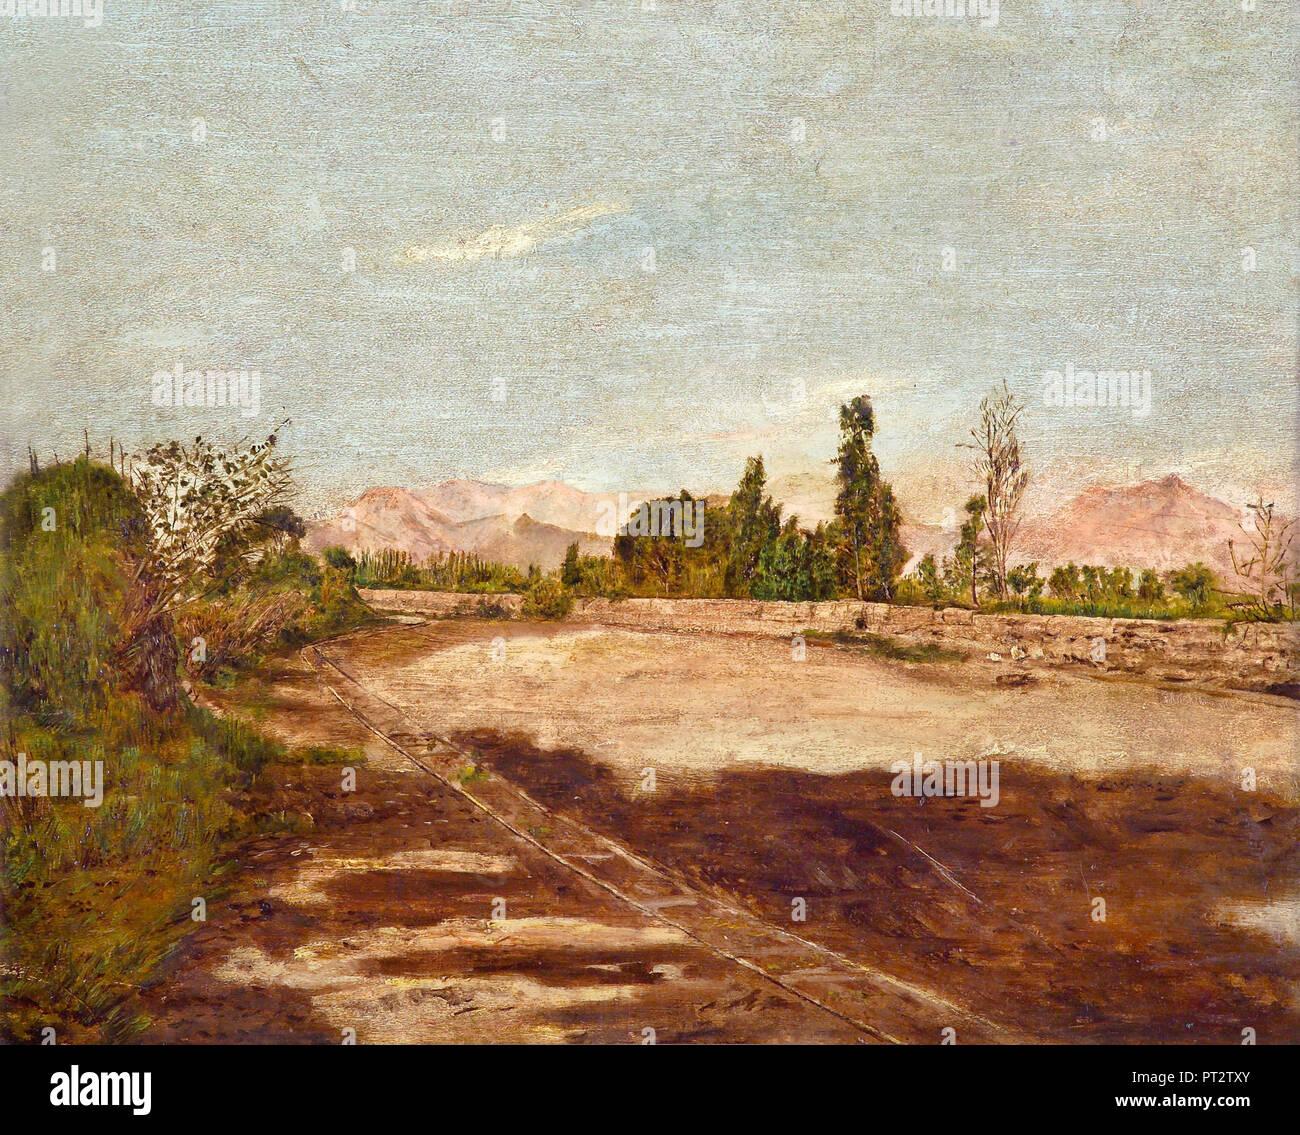 Jose Maria Eguren, Lima's Countryside, Circa 1900-1915 Oil on canvas, Lima Art Museum (MALI), Lima, Peru. - Stock Image